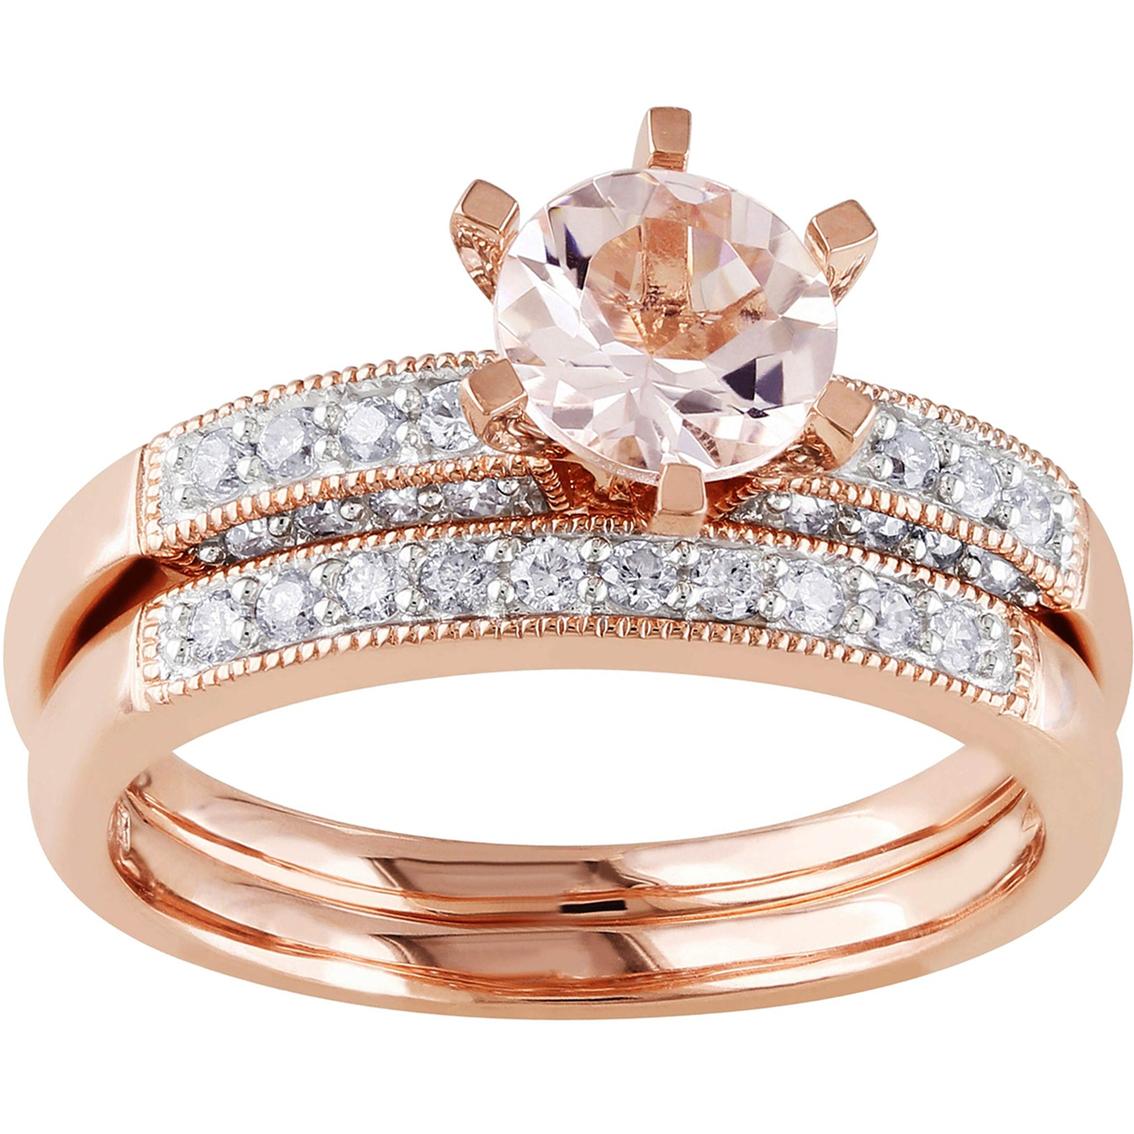 Pink Gold Diamond Bands: Sofia B. 10k Pink Gold 1/3 Ctw Diamond And Morganite